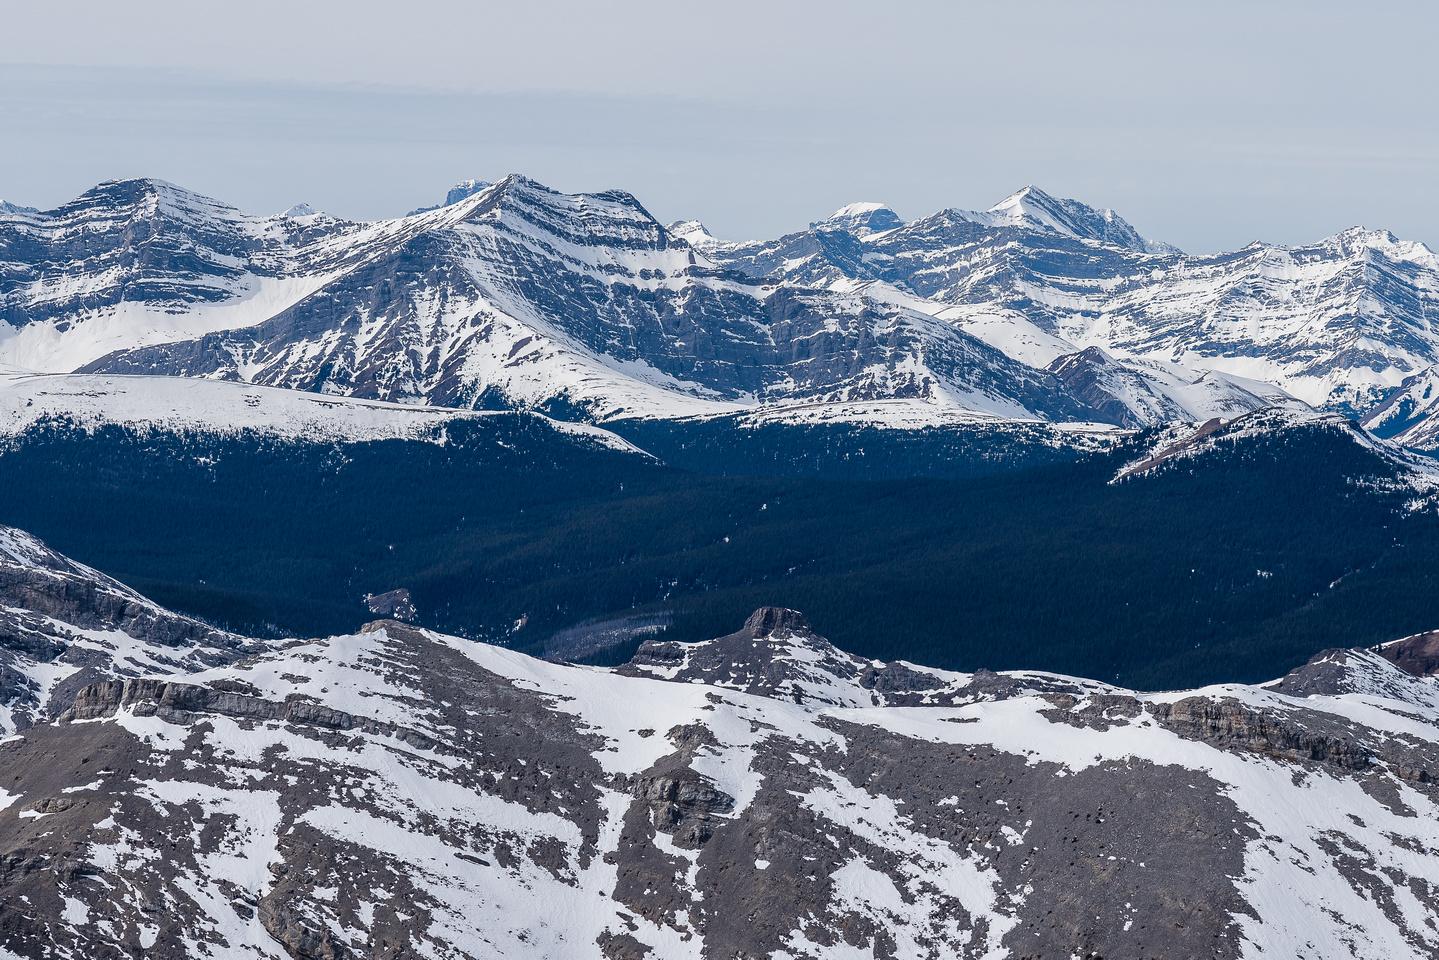 Looking far off towards Mount Douglas.